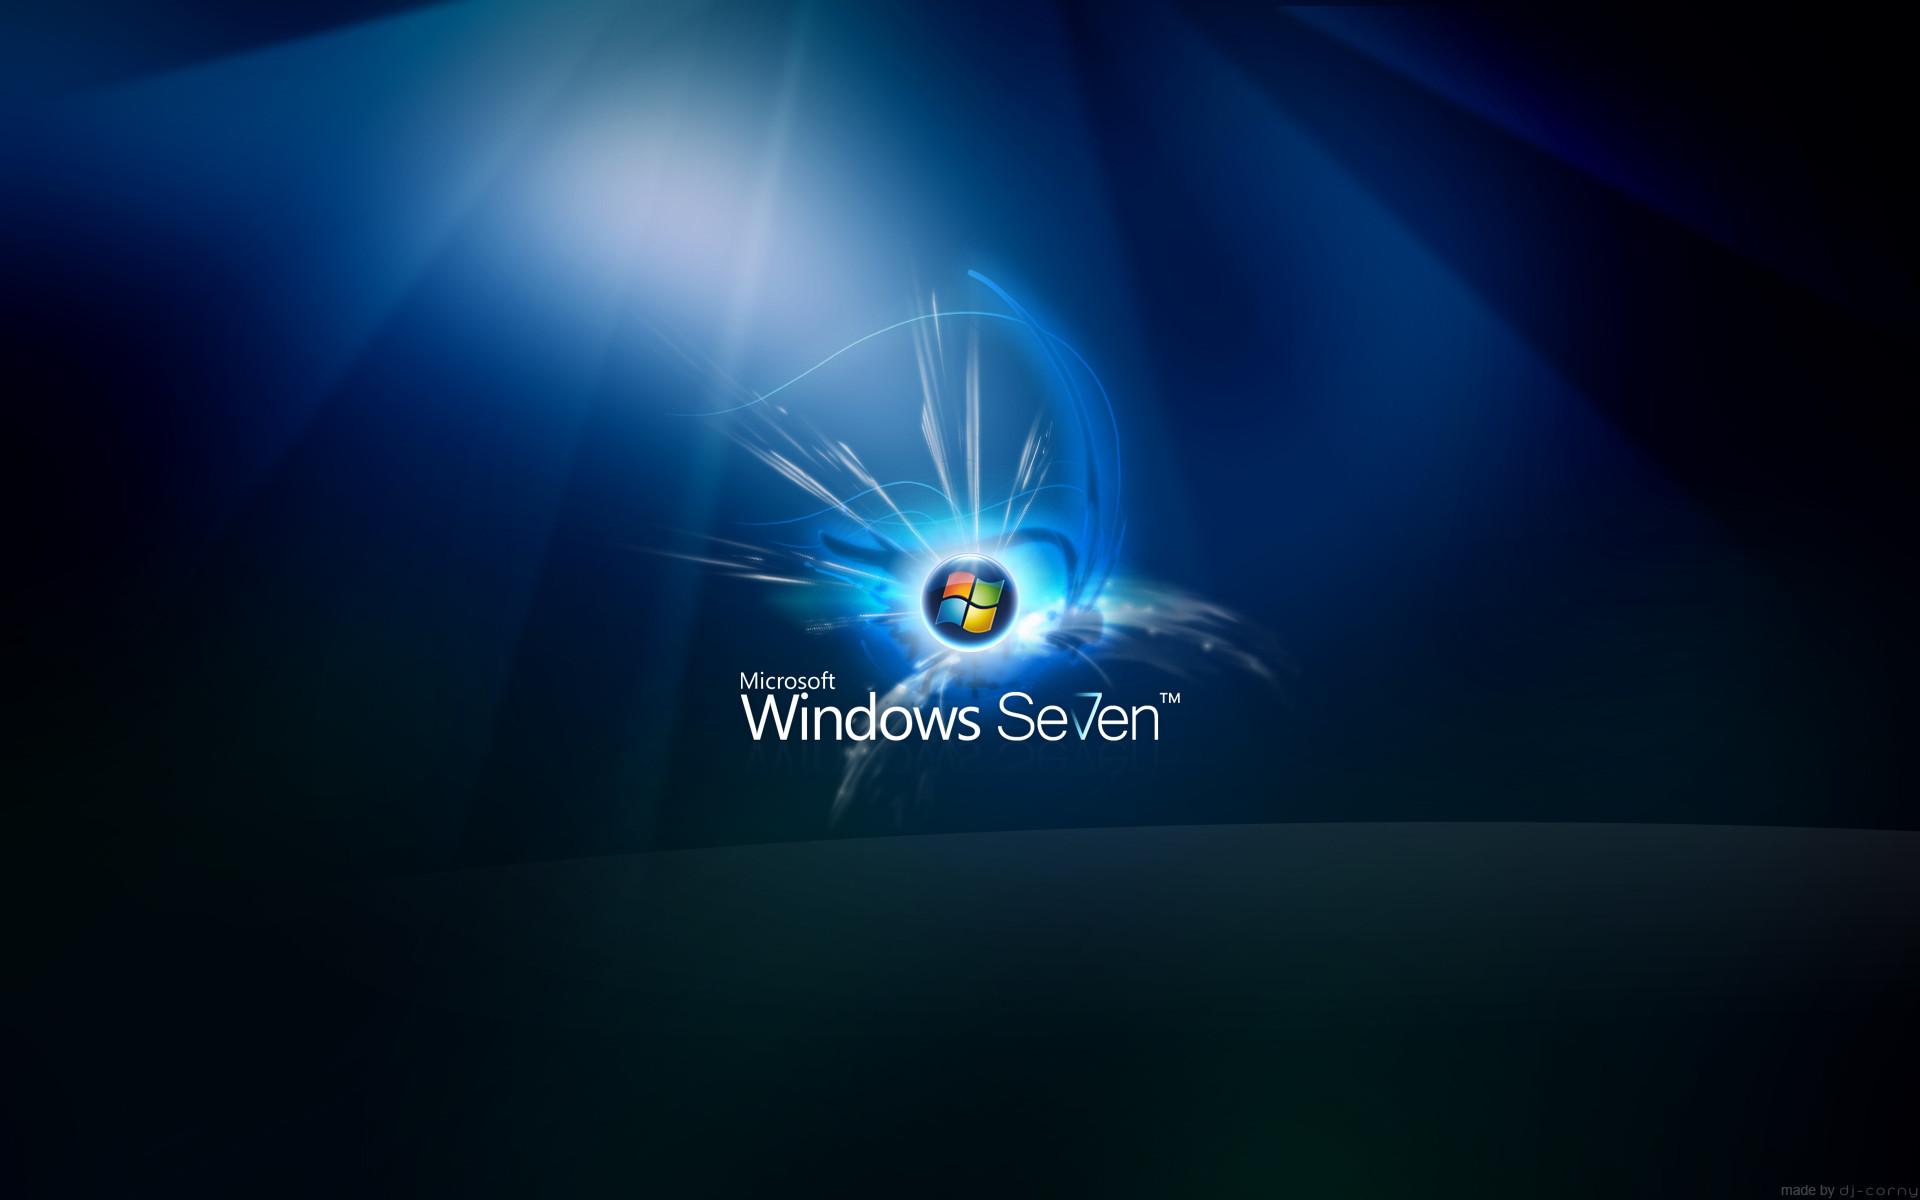 Animated Desktop Wallpaper For Windows Wallpaper Widescreen 1920×1200  Windows 7 Desktop Backgrounds (48